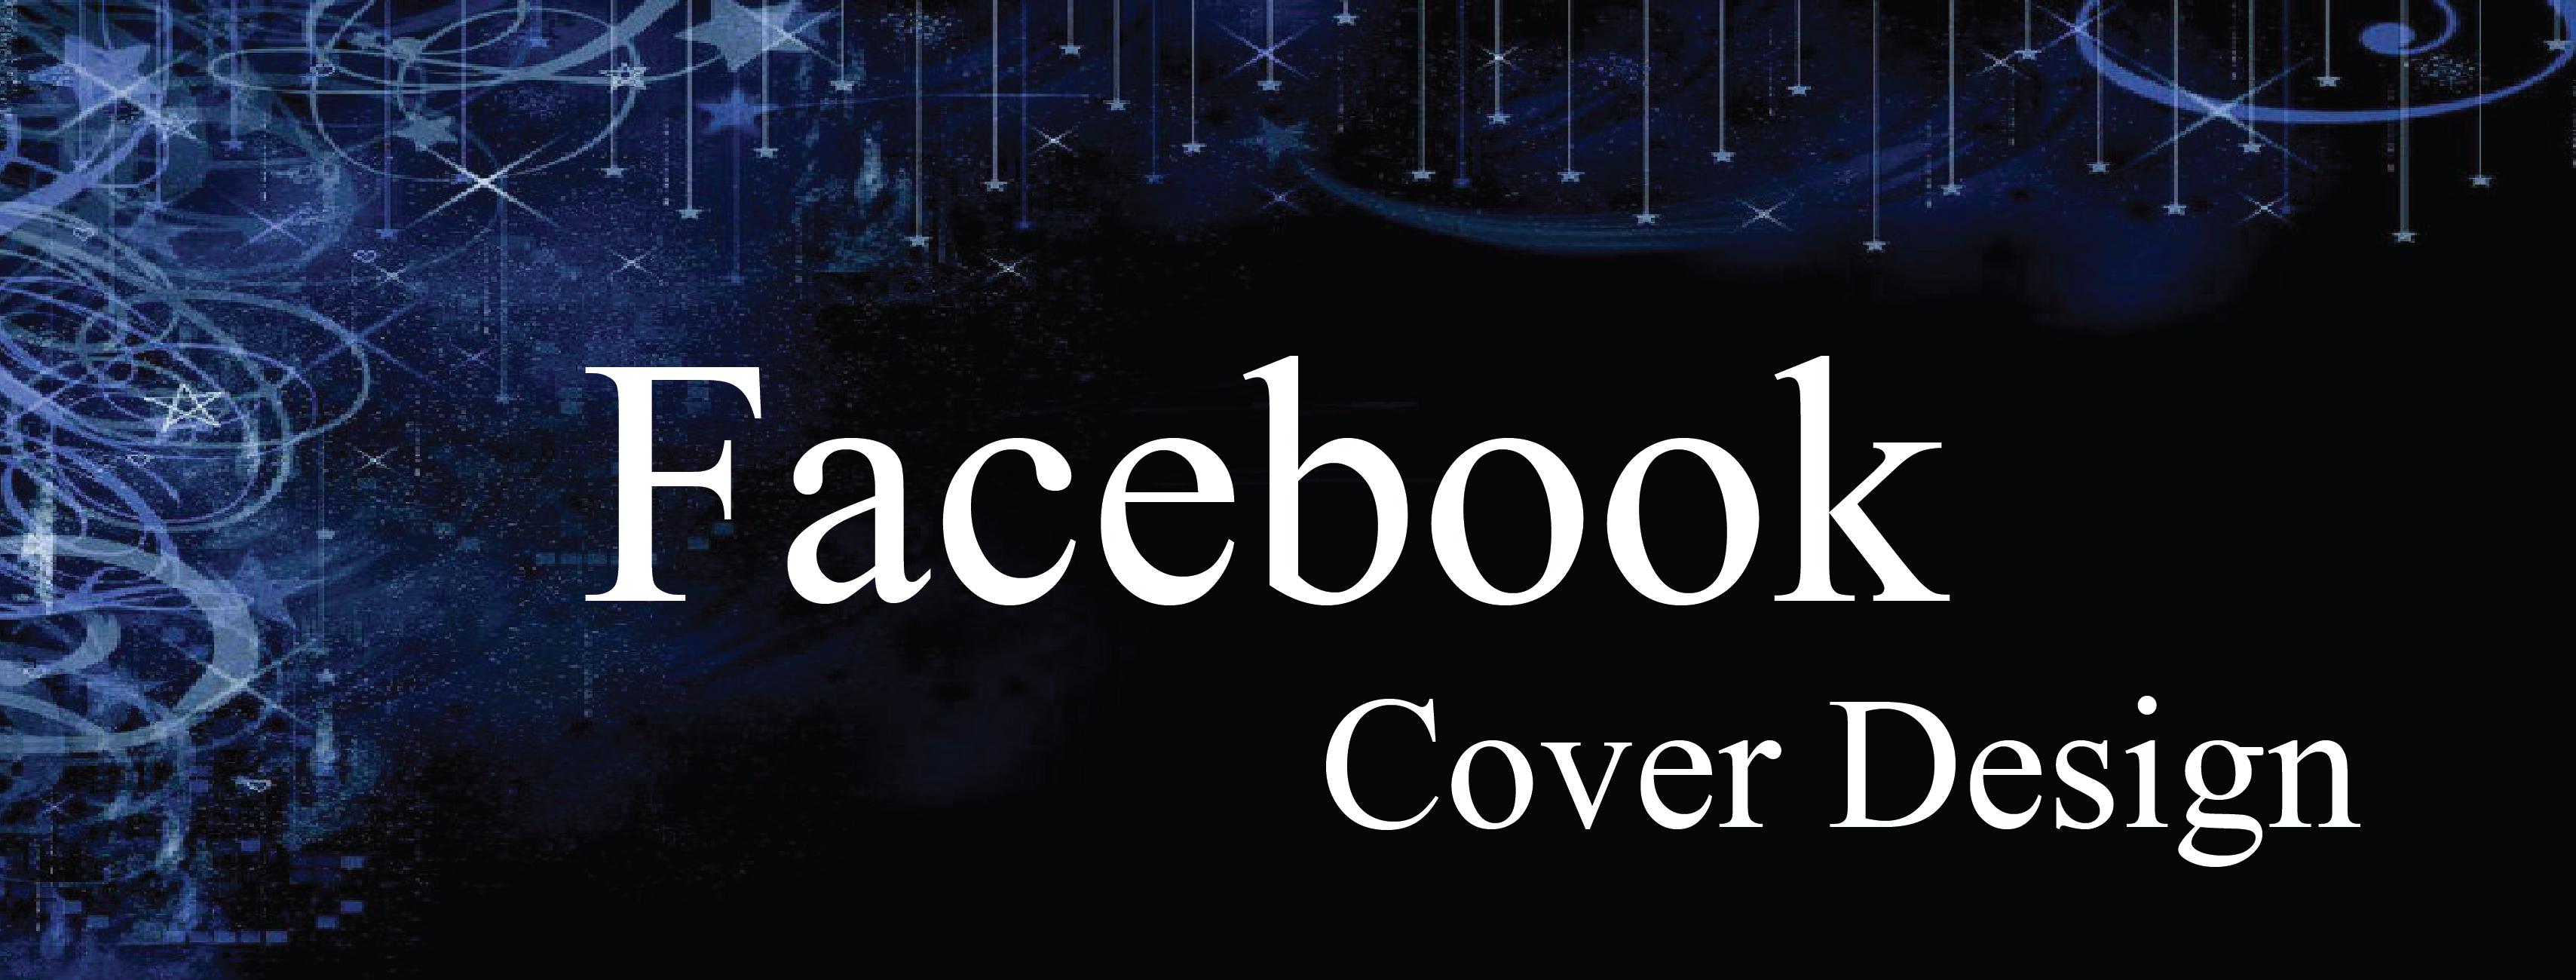 I will design creative 6 social media posts for facebook